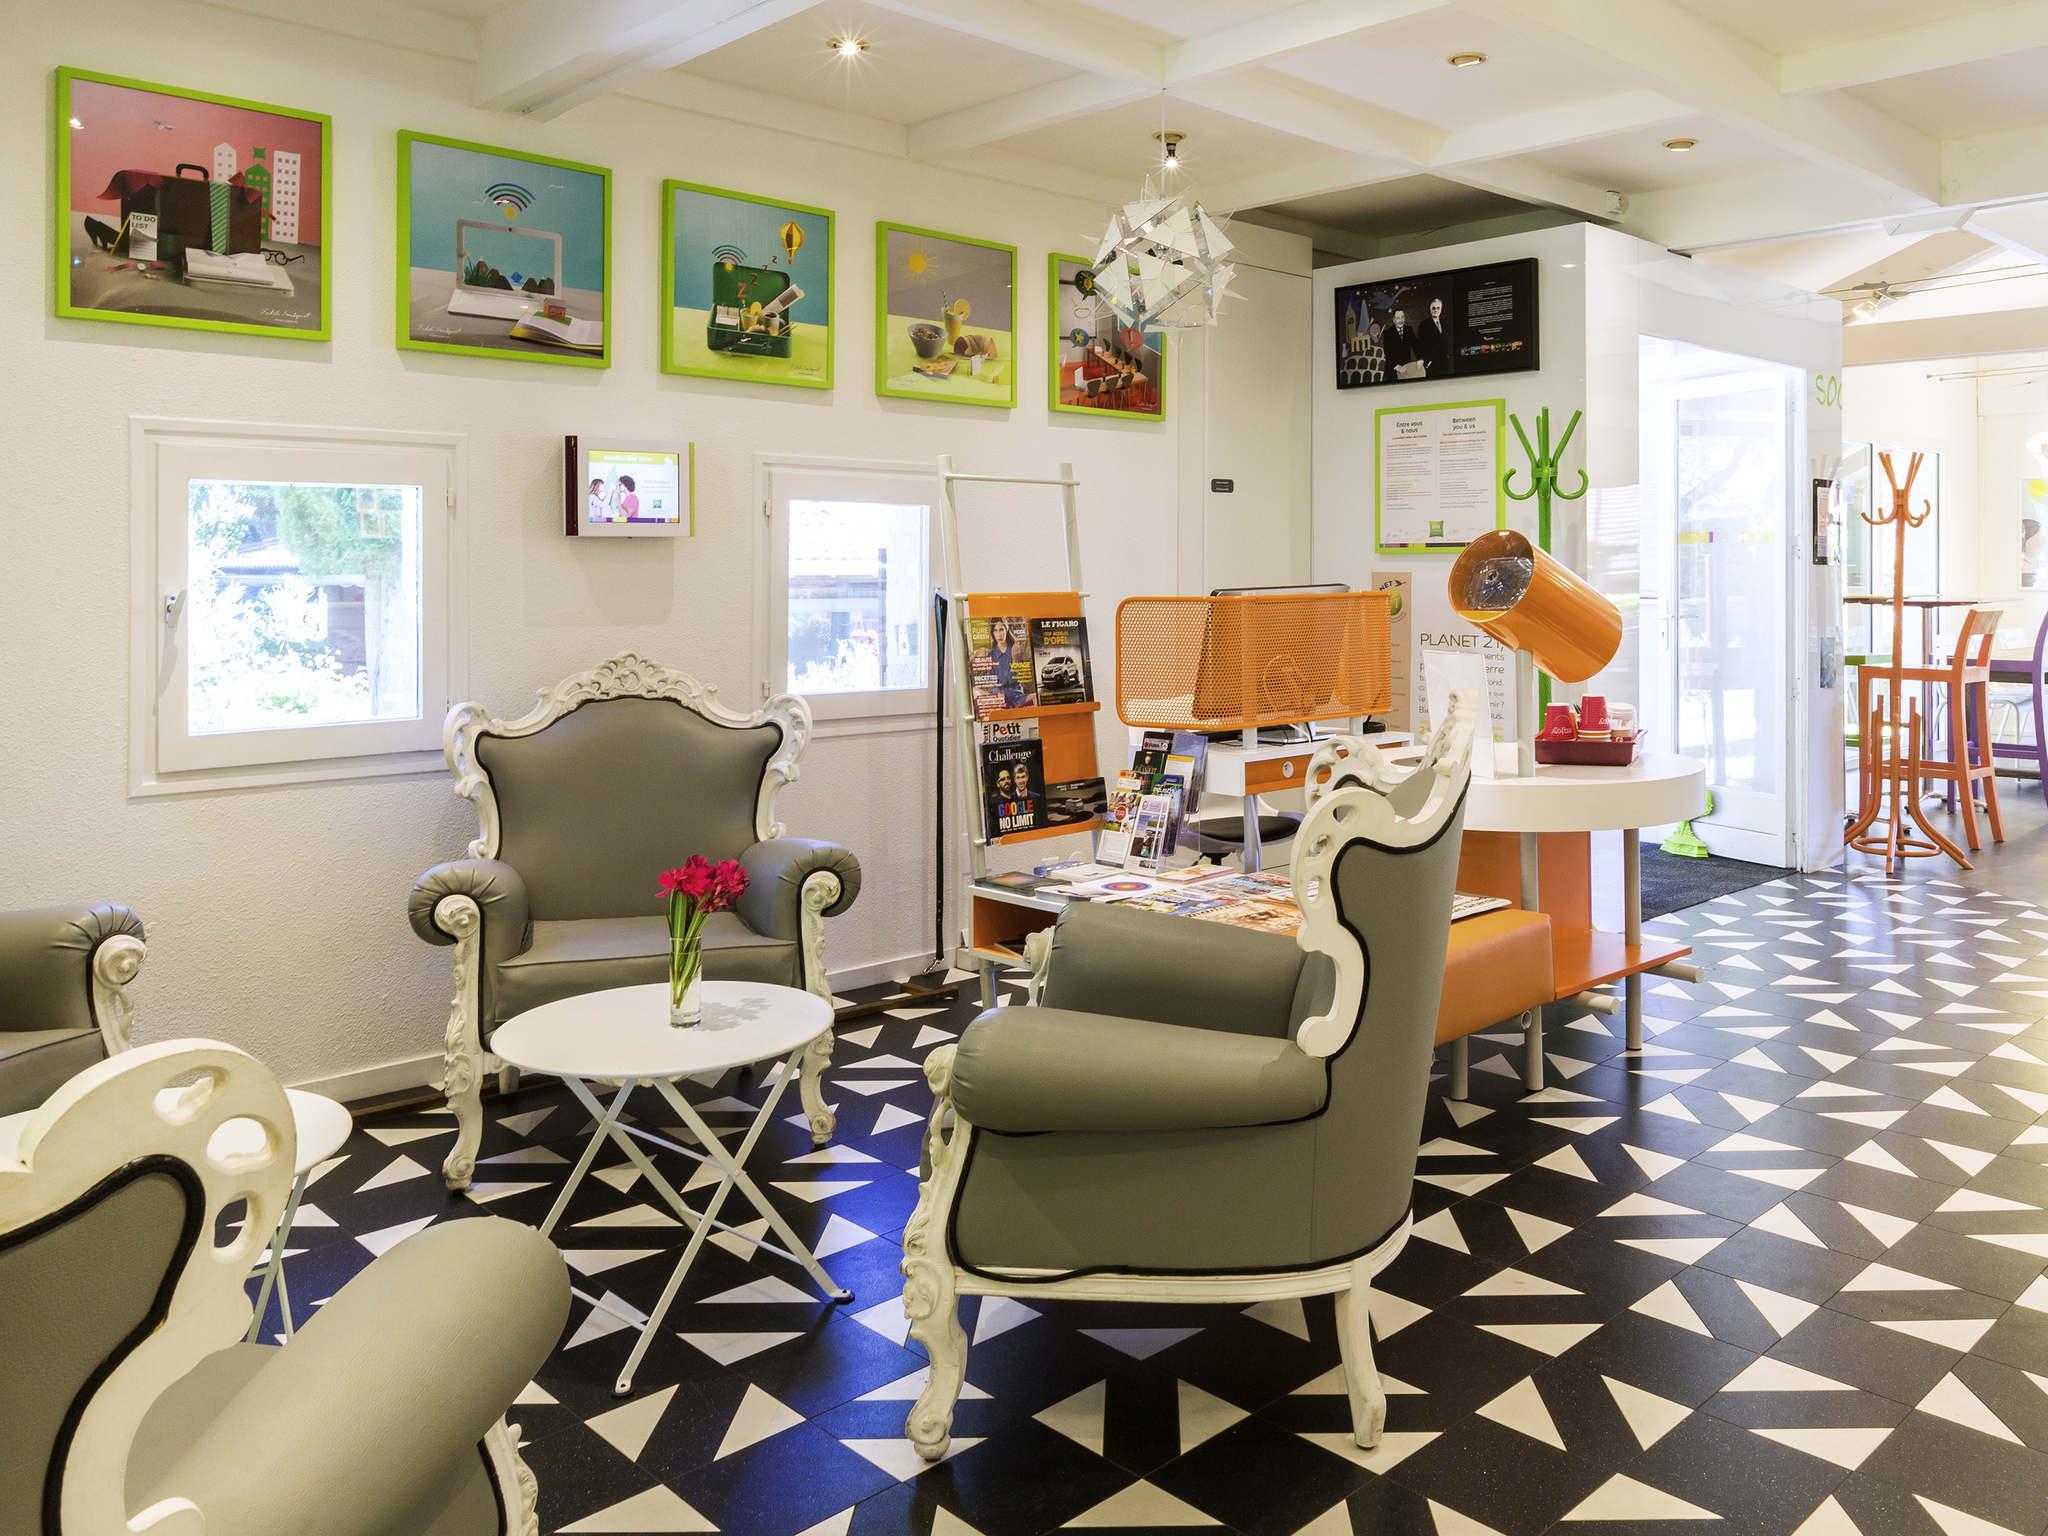 Hotel – ibis Styles Aix-en-Provence Mas des Oliviers